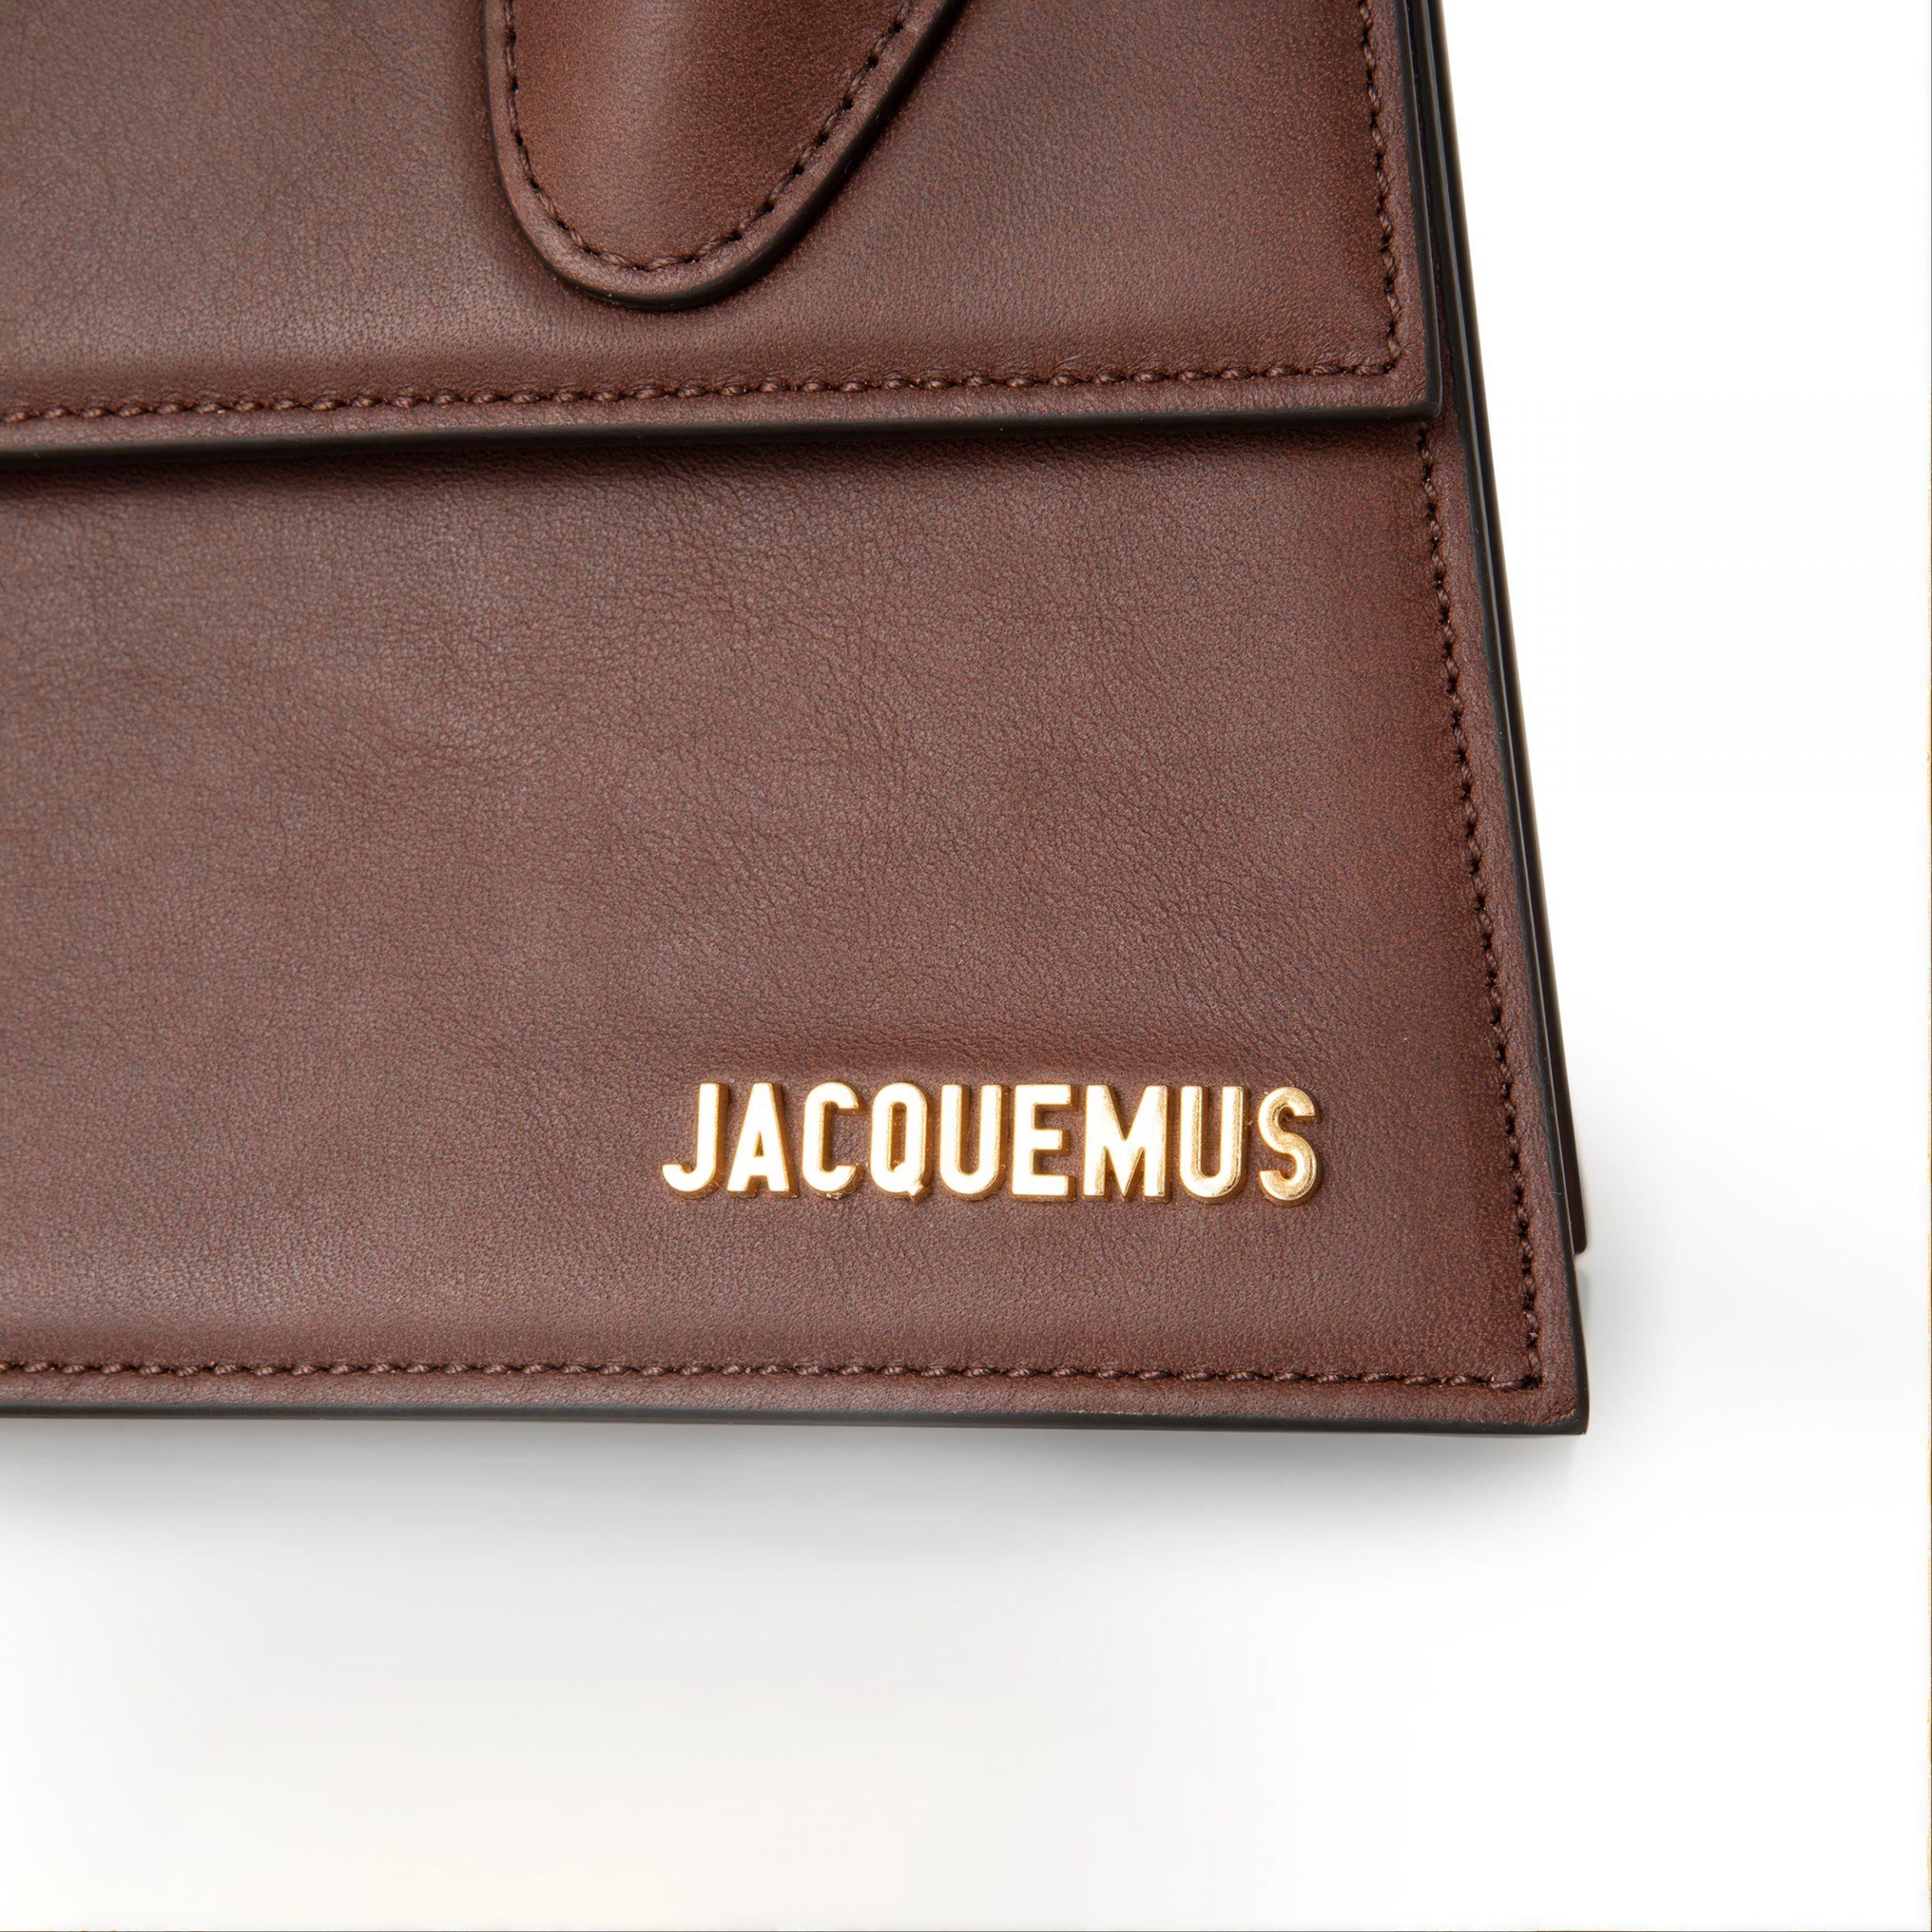 Сумка Jacquemus Le grand Chiquito коричневая